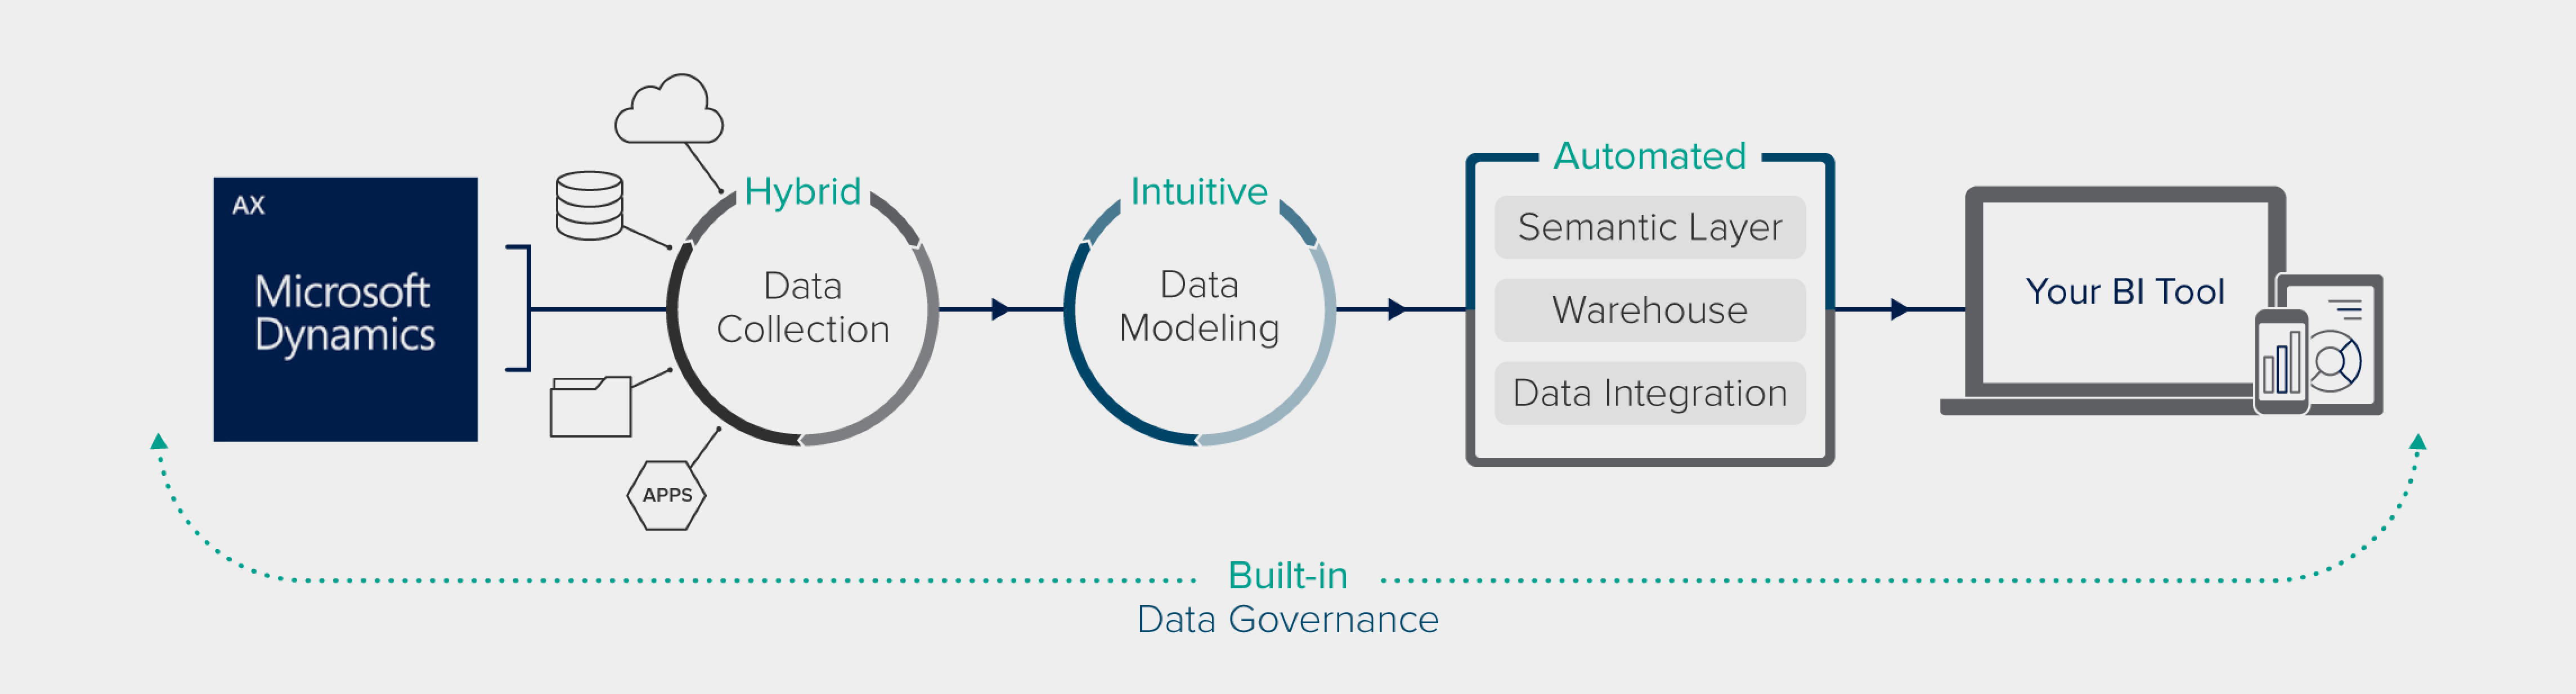 Dynamics AX Data Management and Analytics Software | ZAP